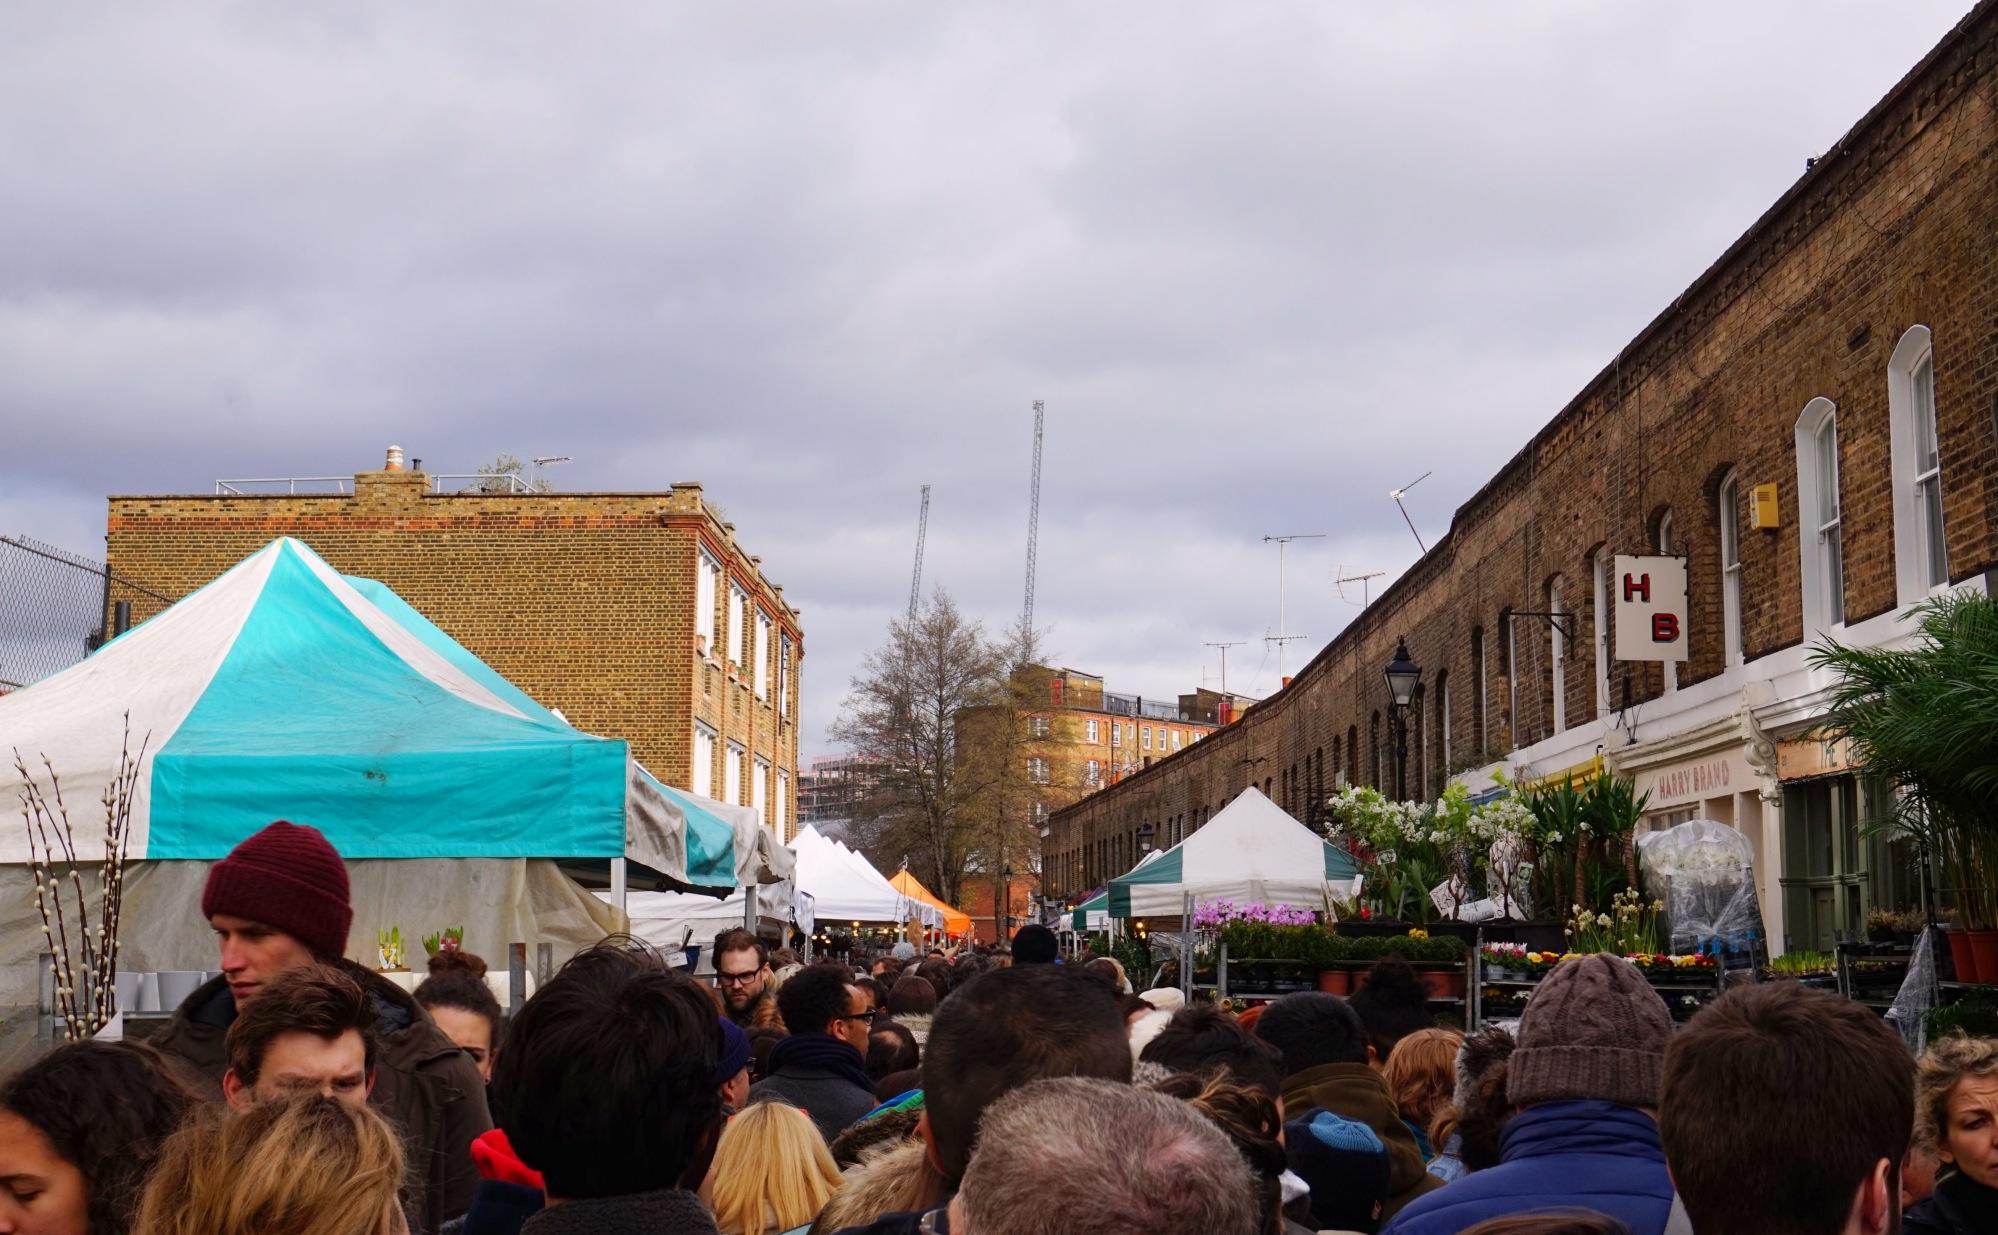 Balade-Columbia-Road-Flower-Market-5